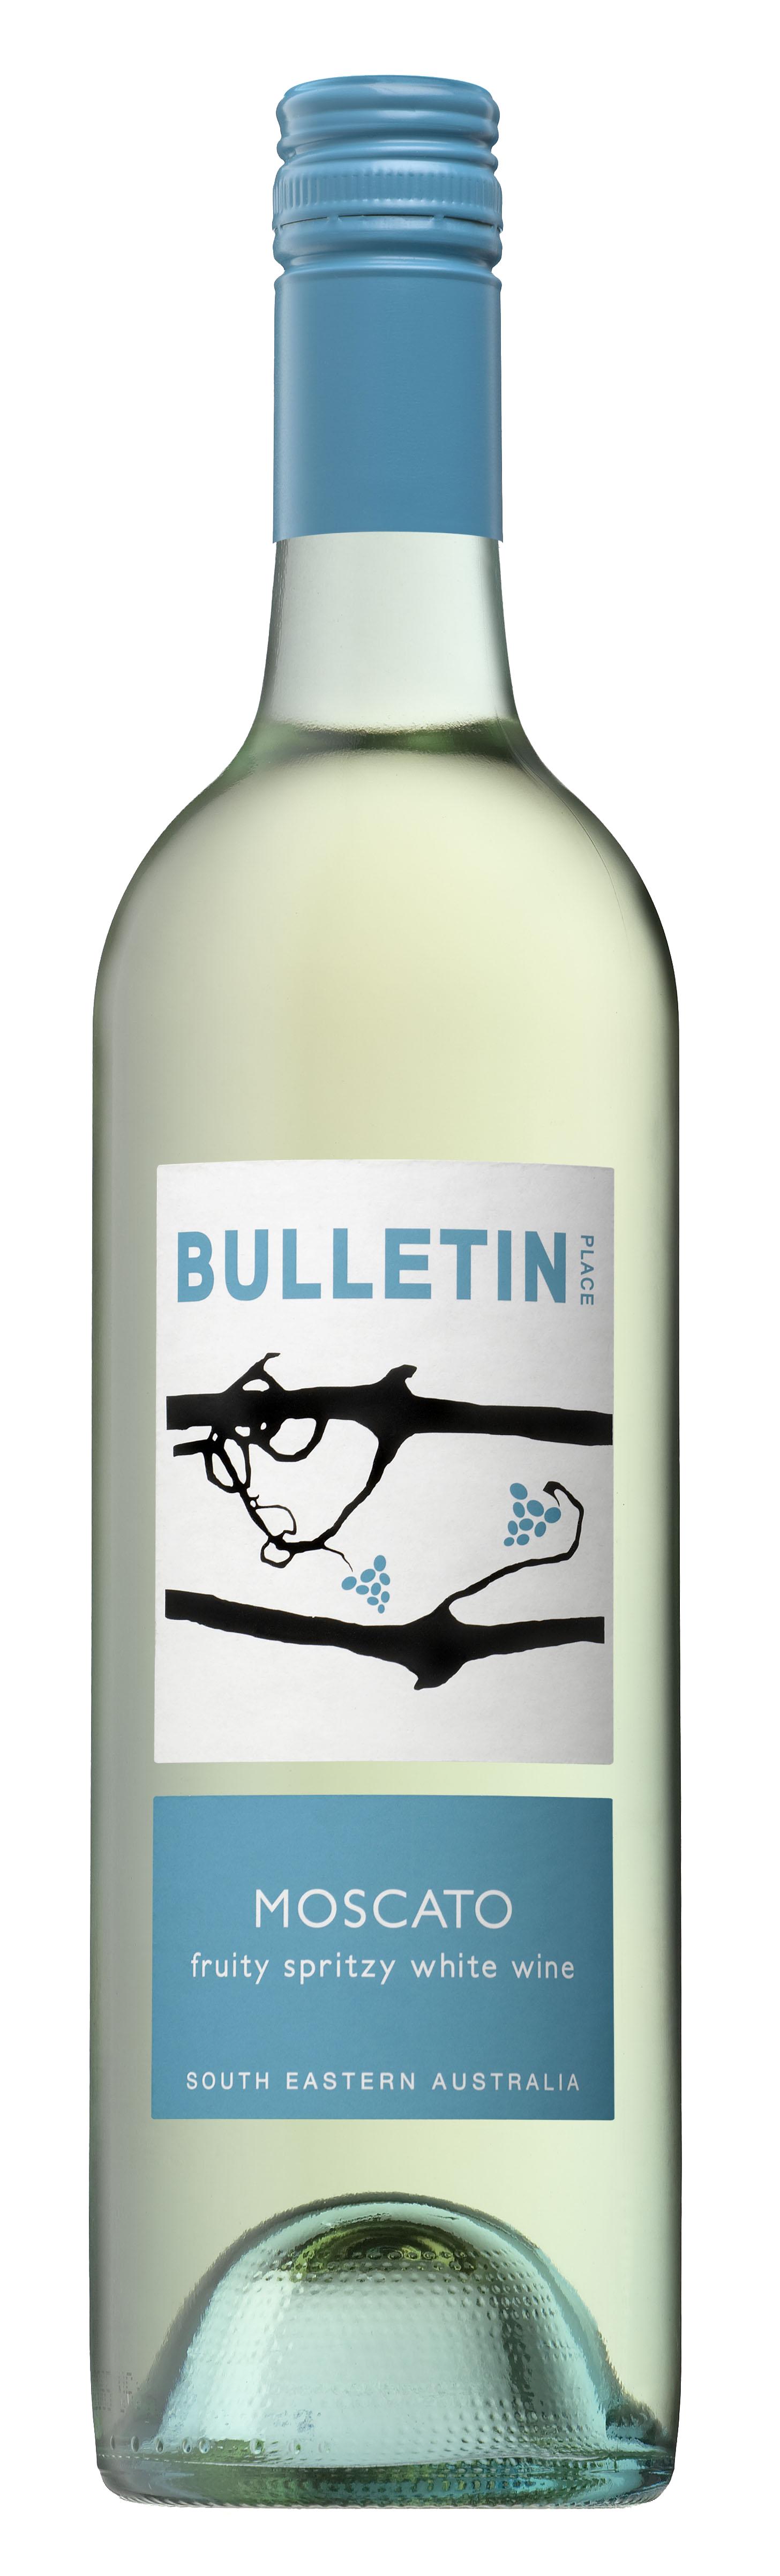 Bulletin Place Moscato Bottle.jpg